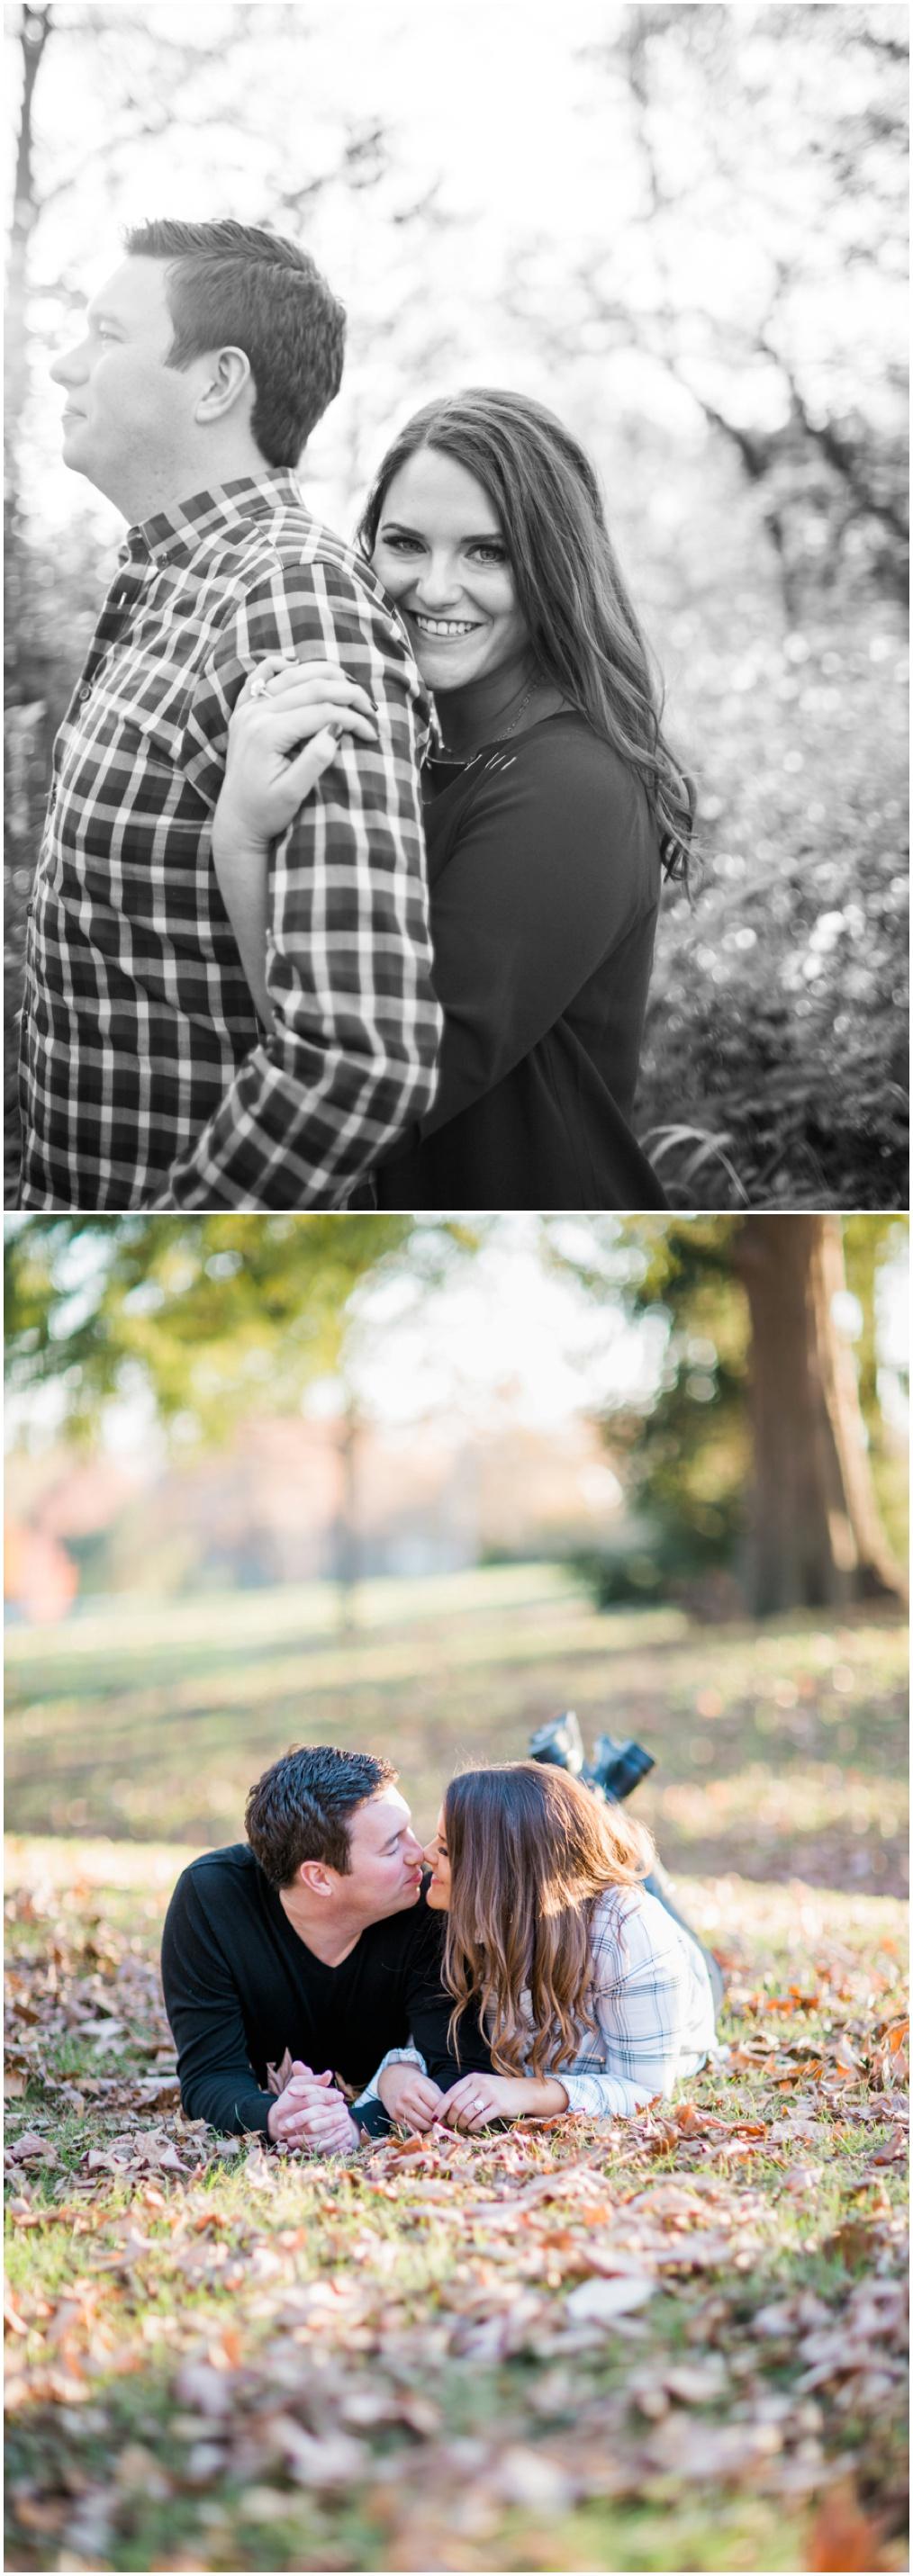 photography-engagement5.jpg